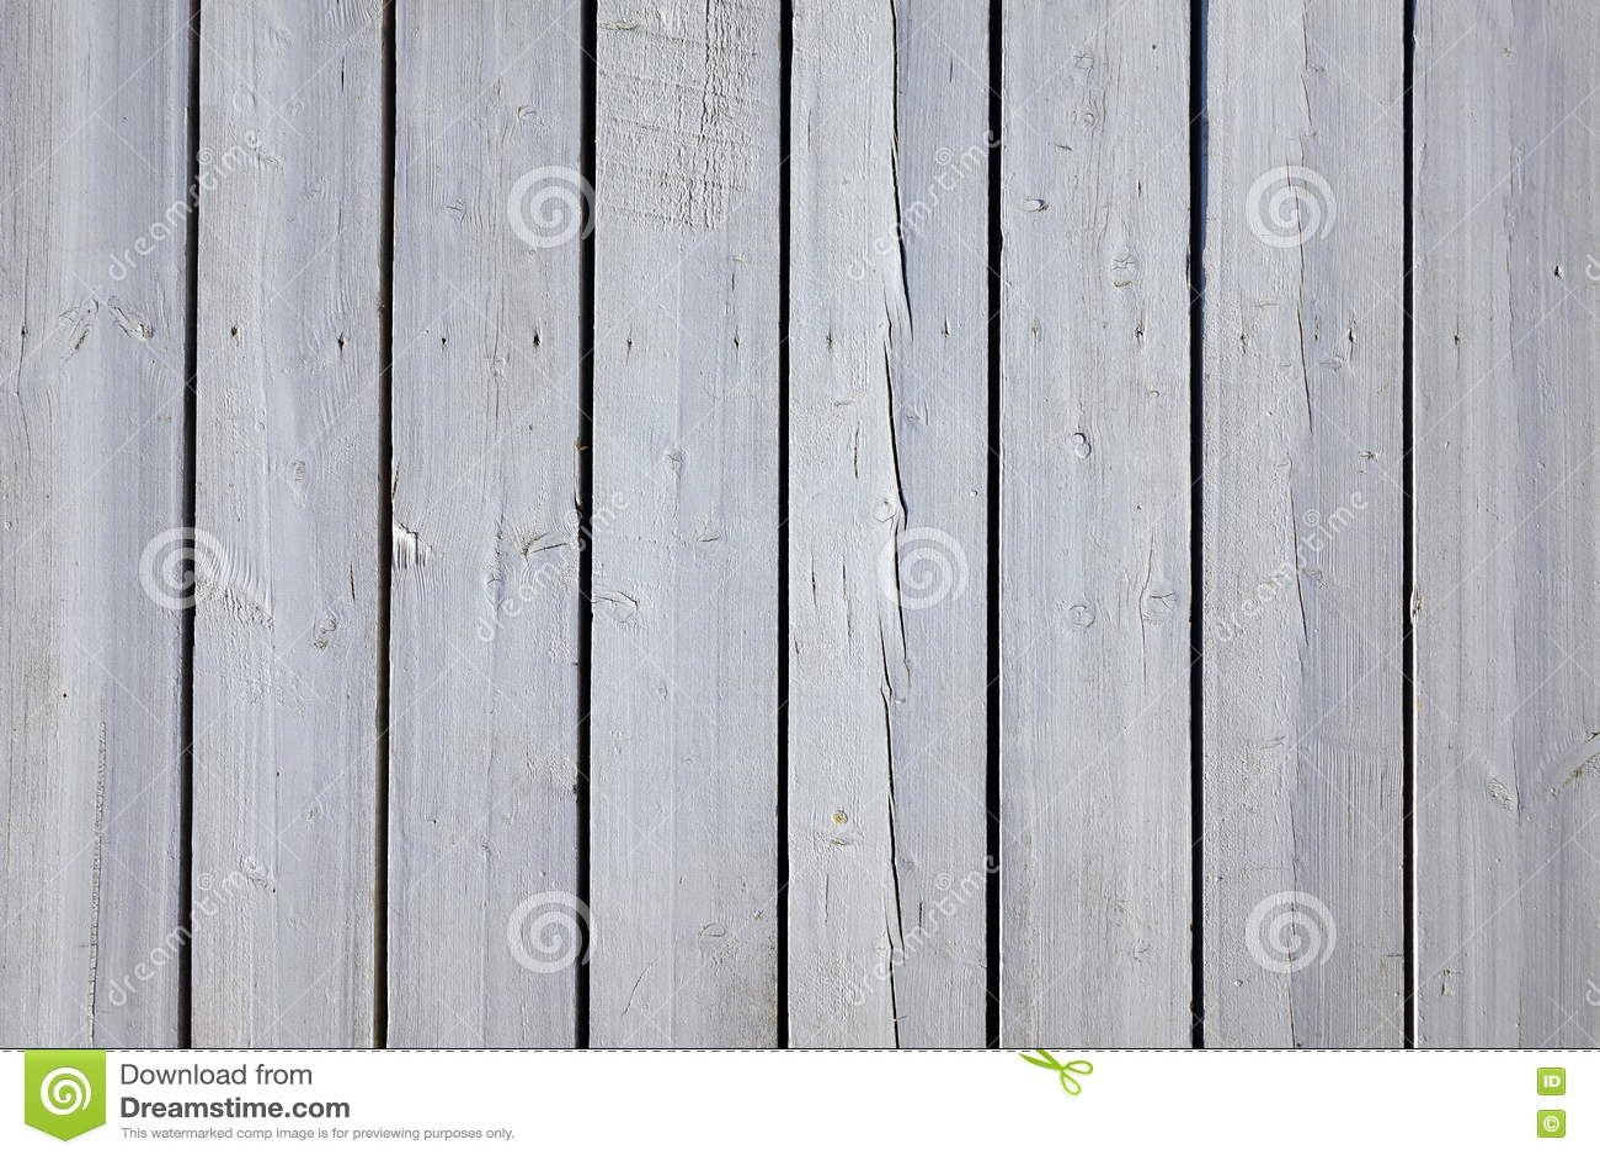 White Patio Wooden Planking Decking Flooring Background